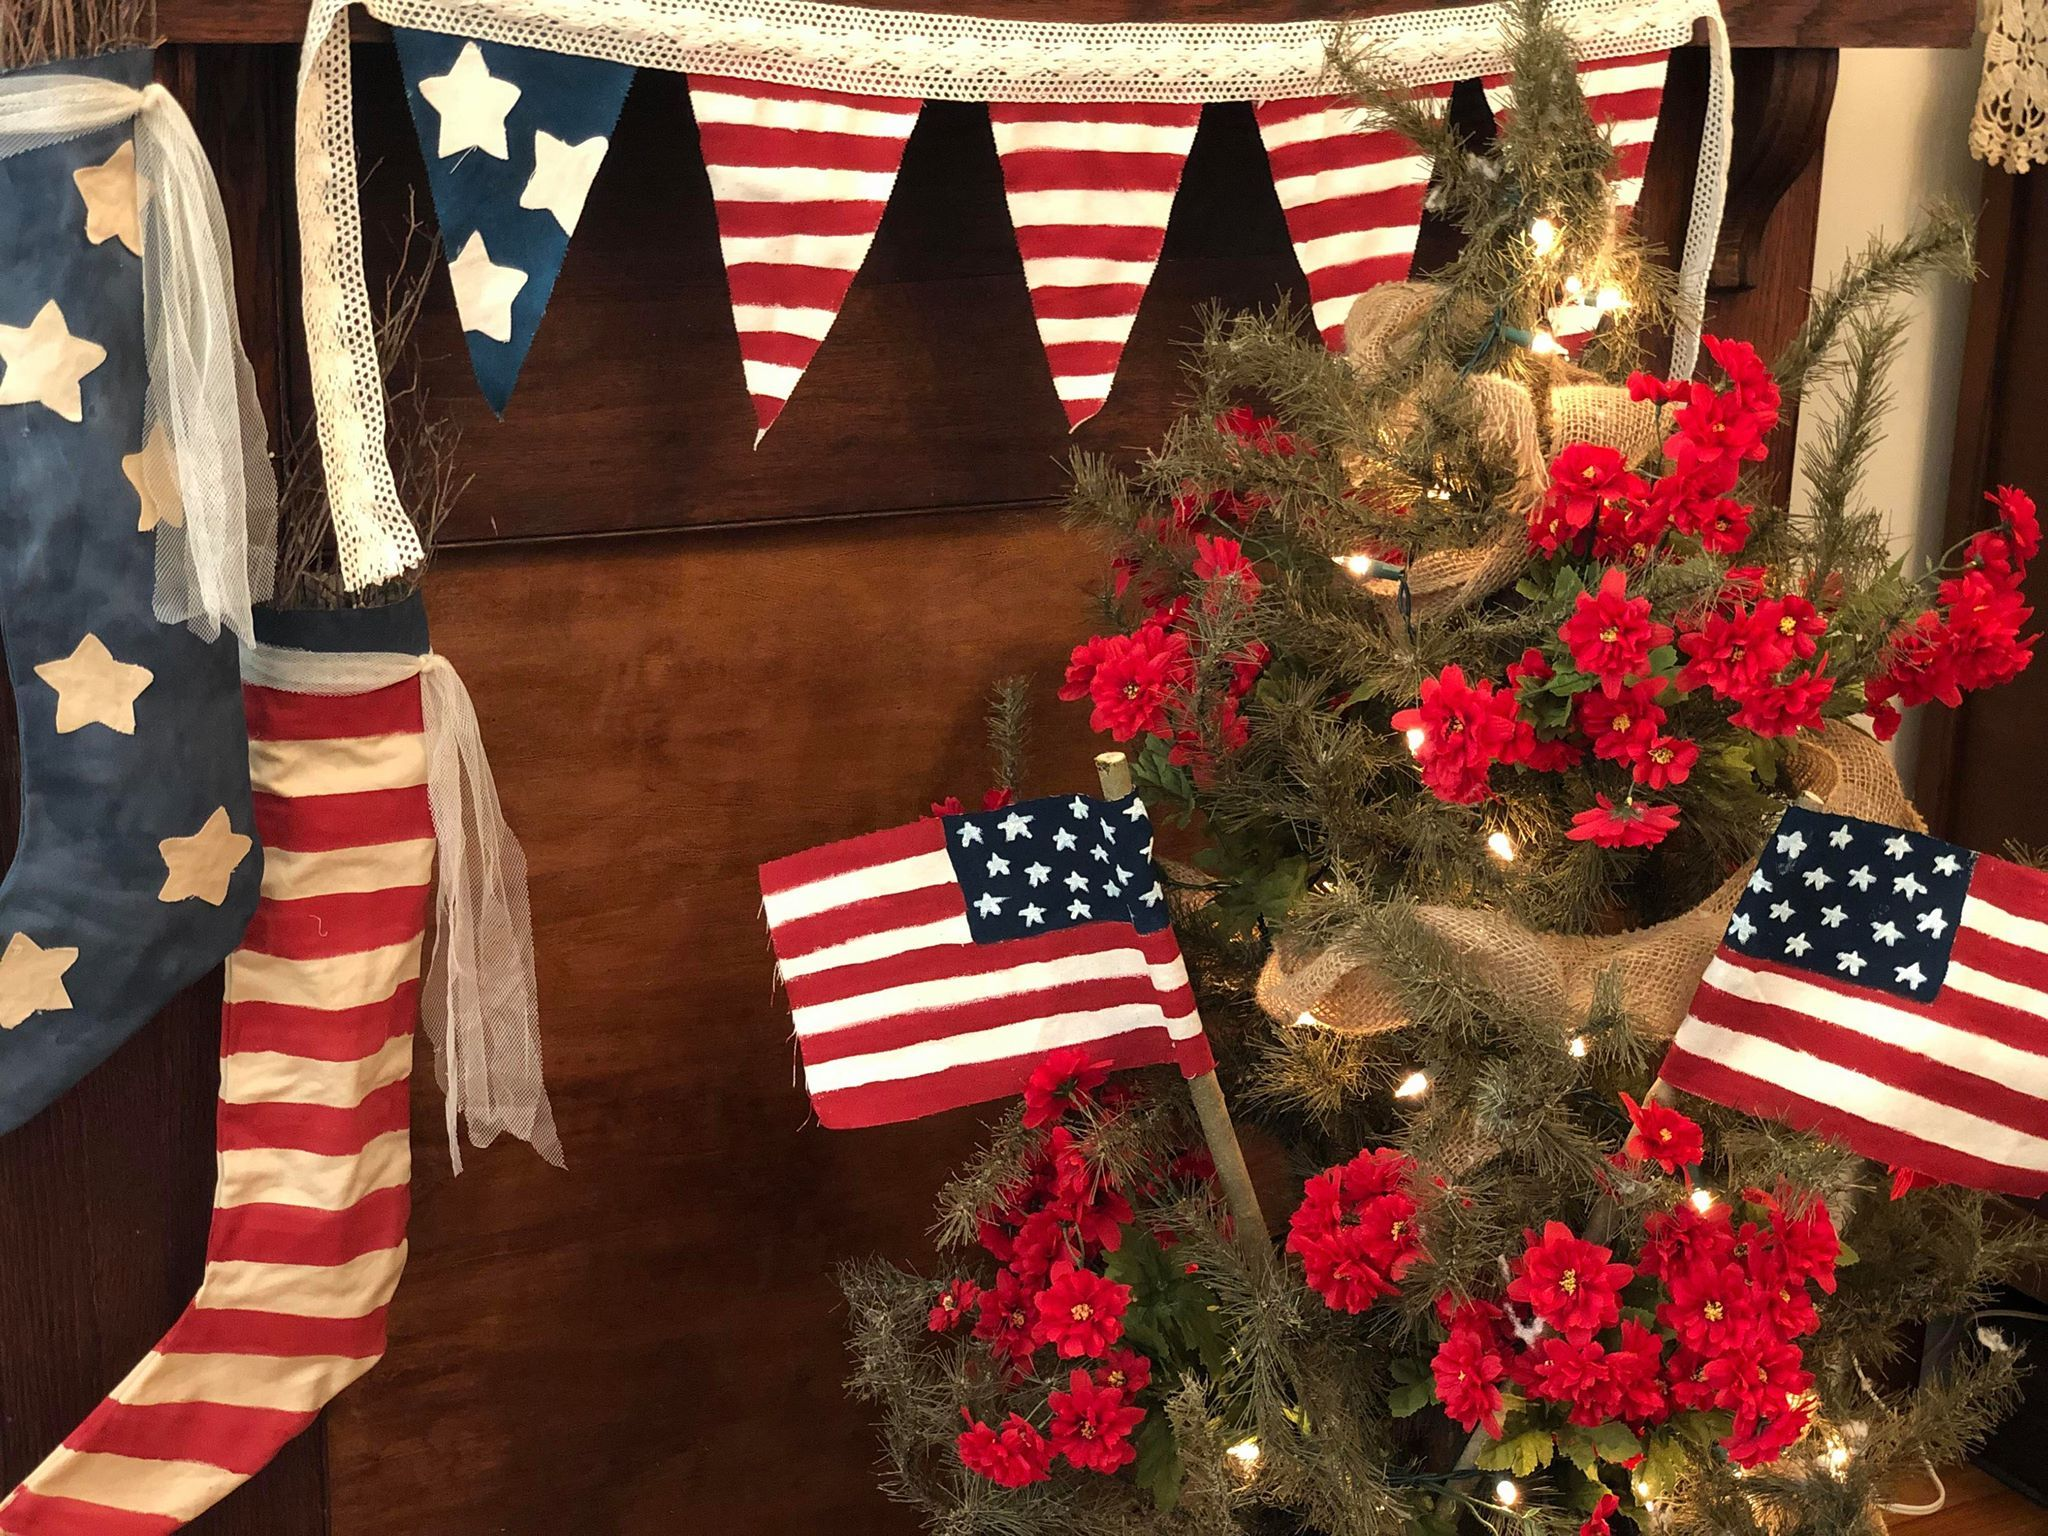 Easy American Flag Diy Lanterns 4th Of July Decorations July Crafts American Flag Diy